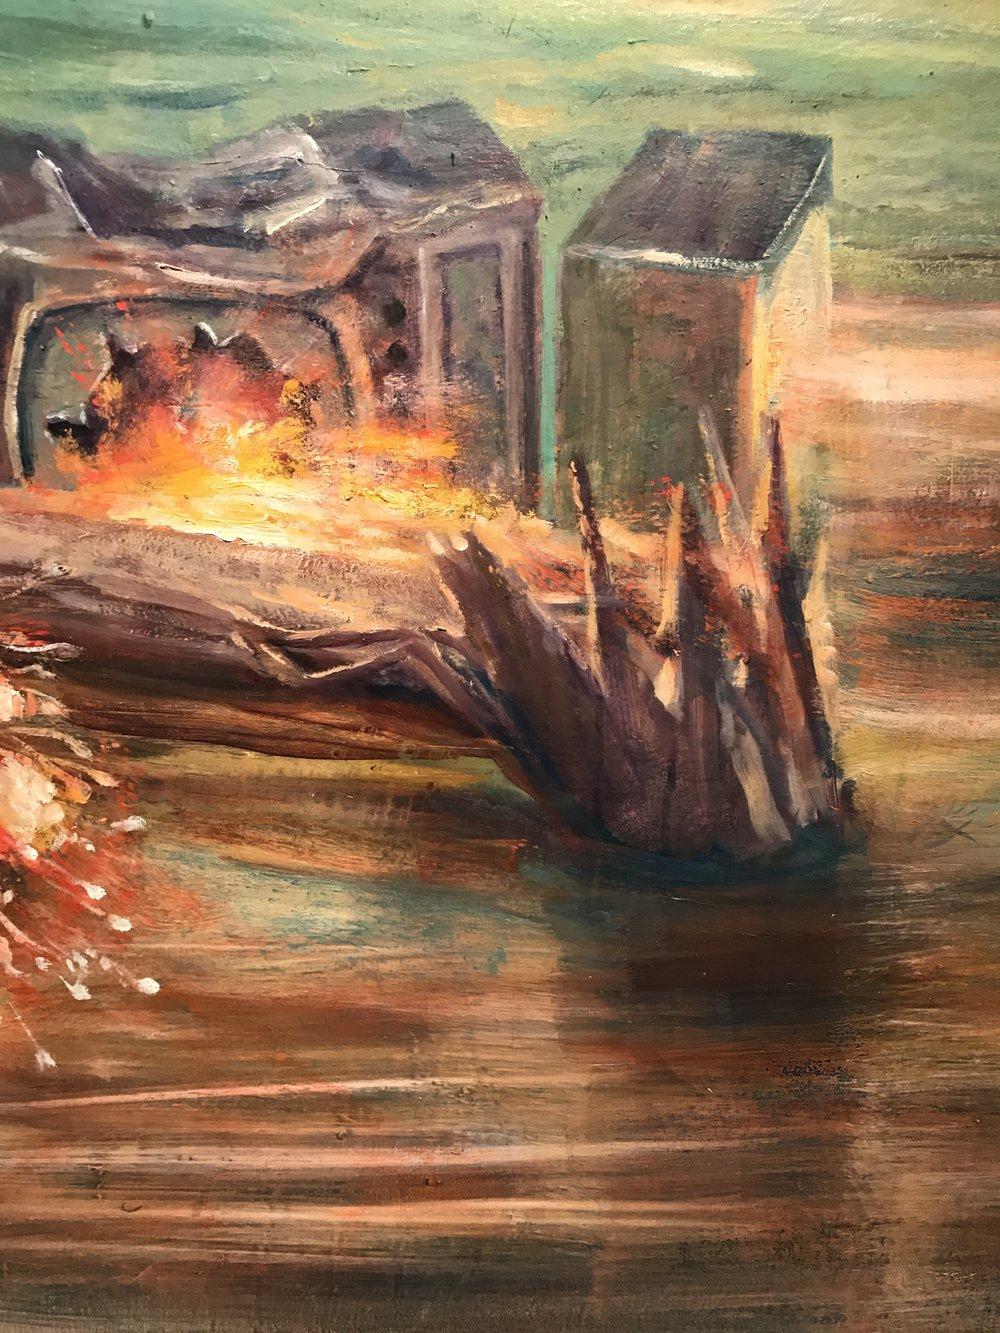 Julie Heffernan,  Camp Bedlam  (detail),2016,oil on canvas,Courtesy of Catharine Clark Gallery.